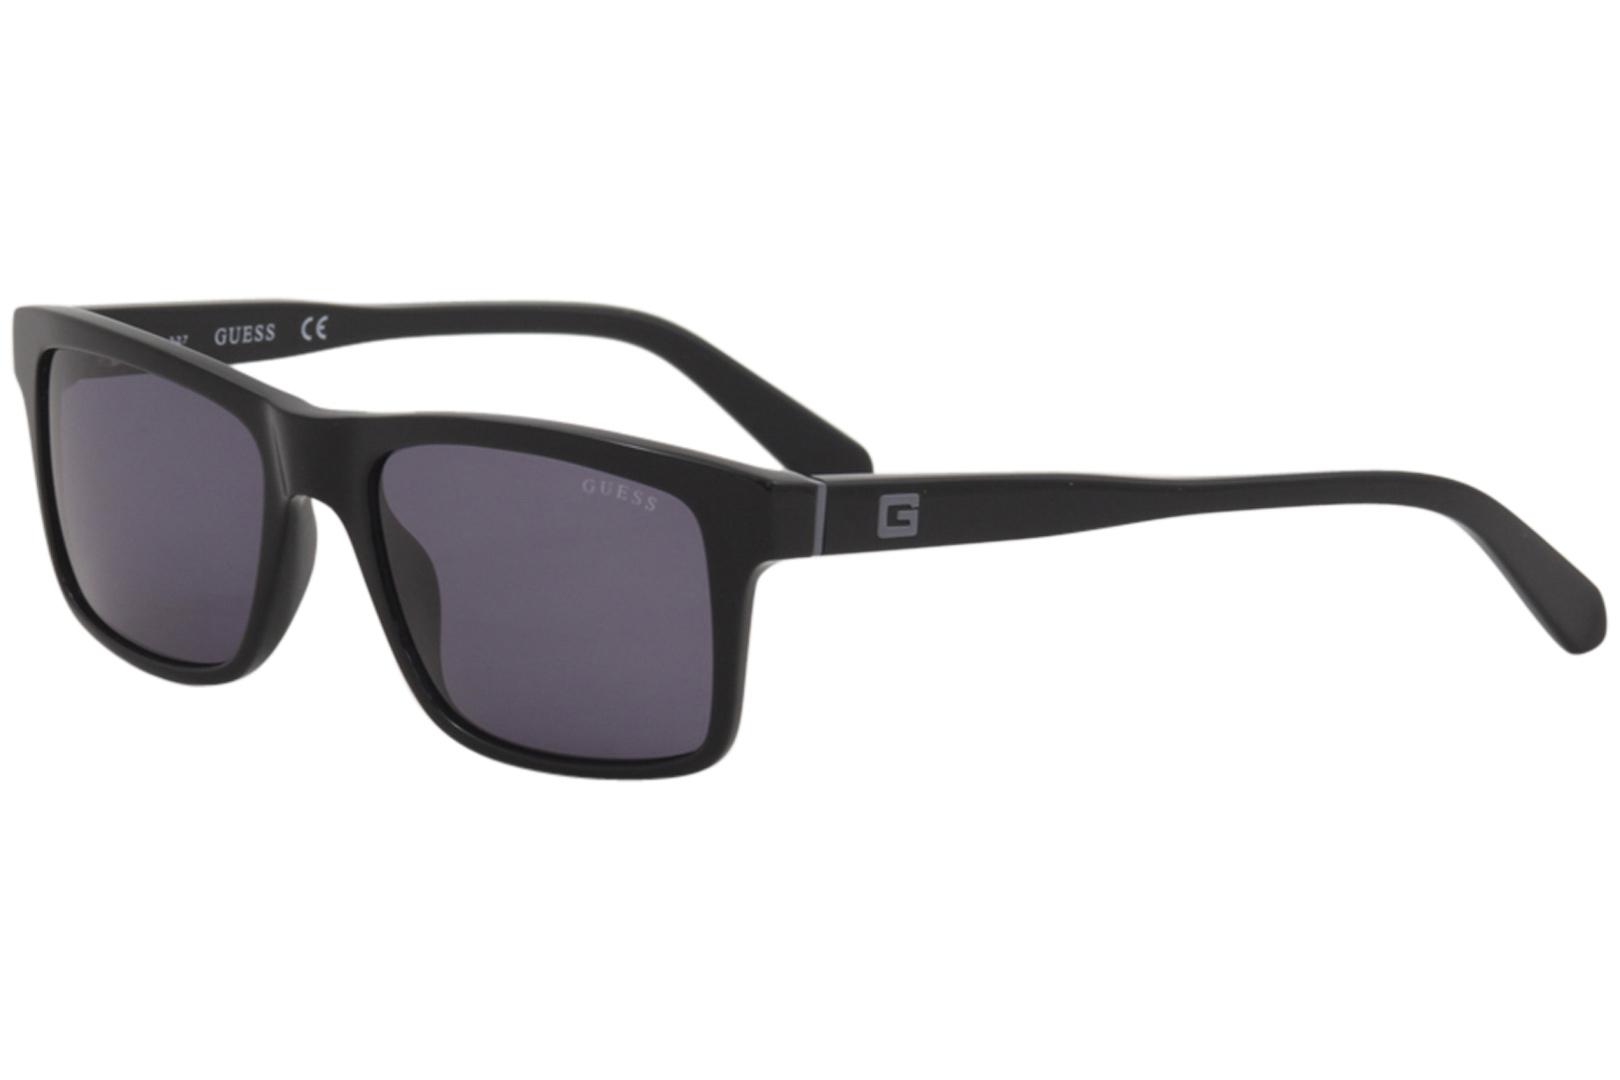 a4c3e38c16 Guess Men s GU6886 GU 6886 01A Black Fashion Rectanlge Sunglasses ...